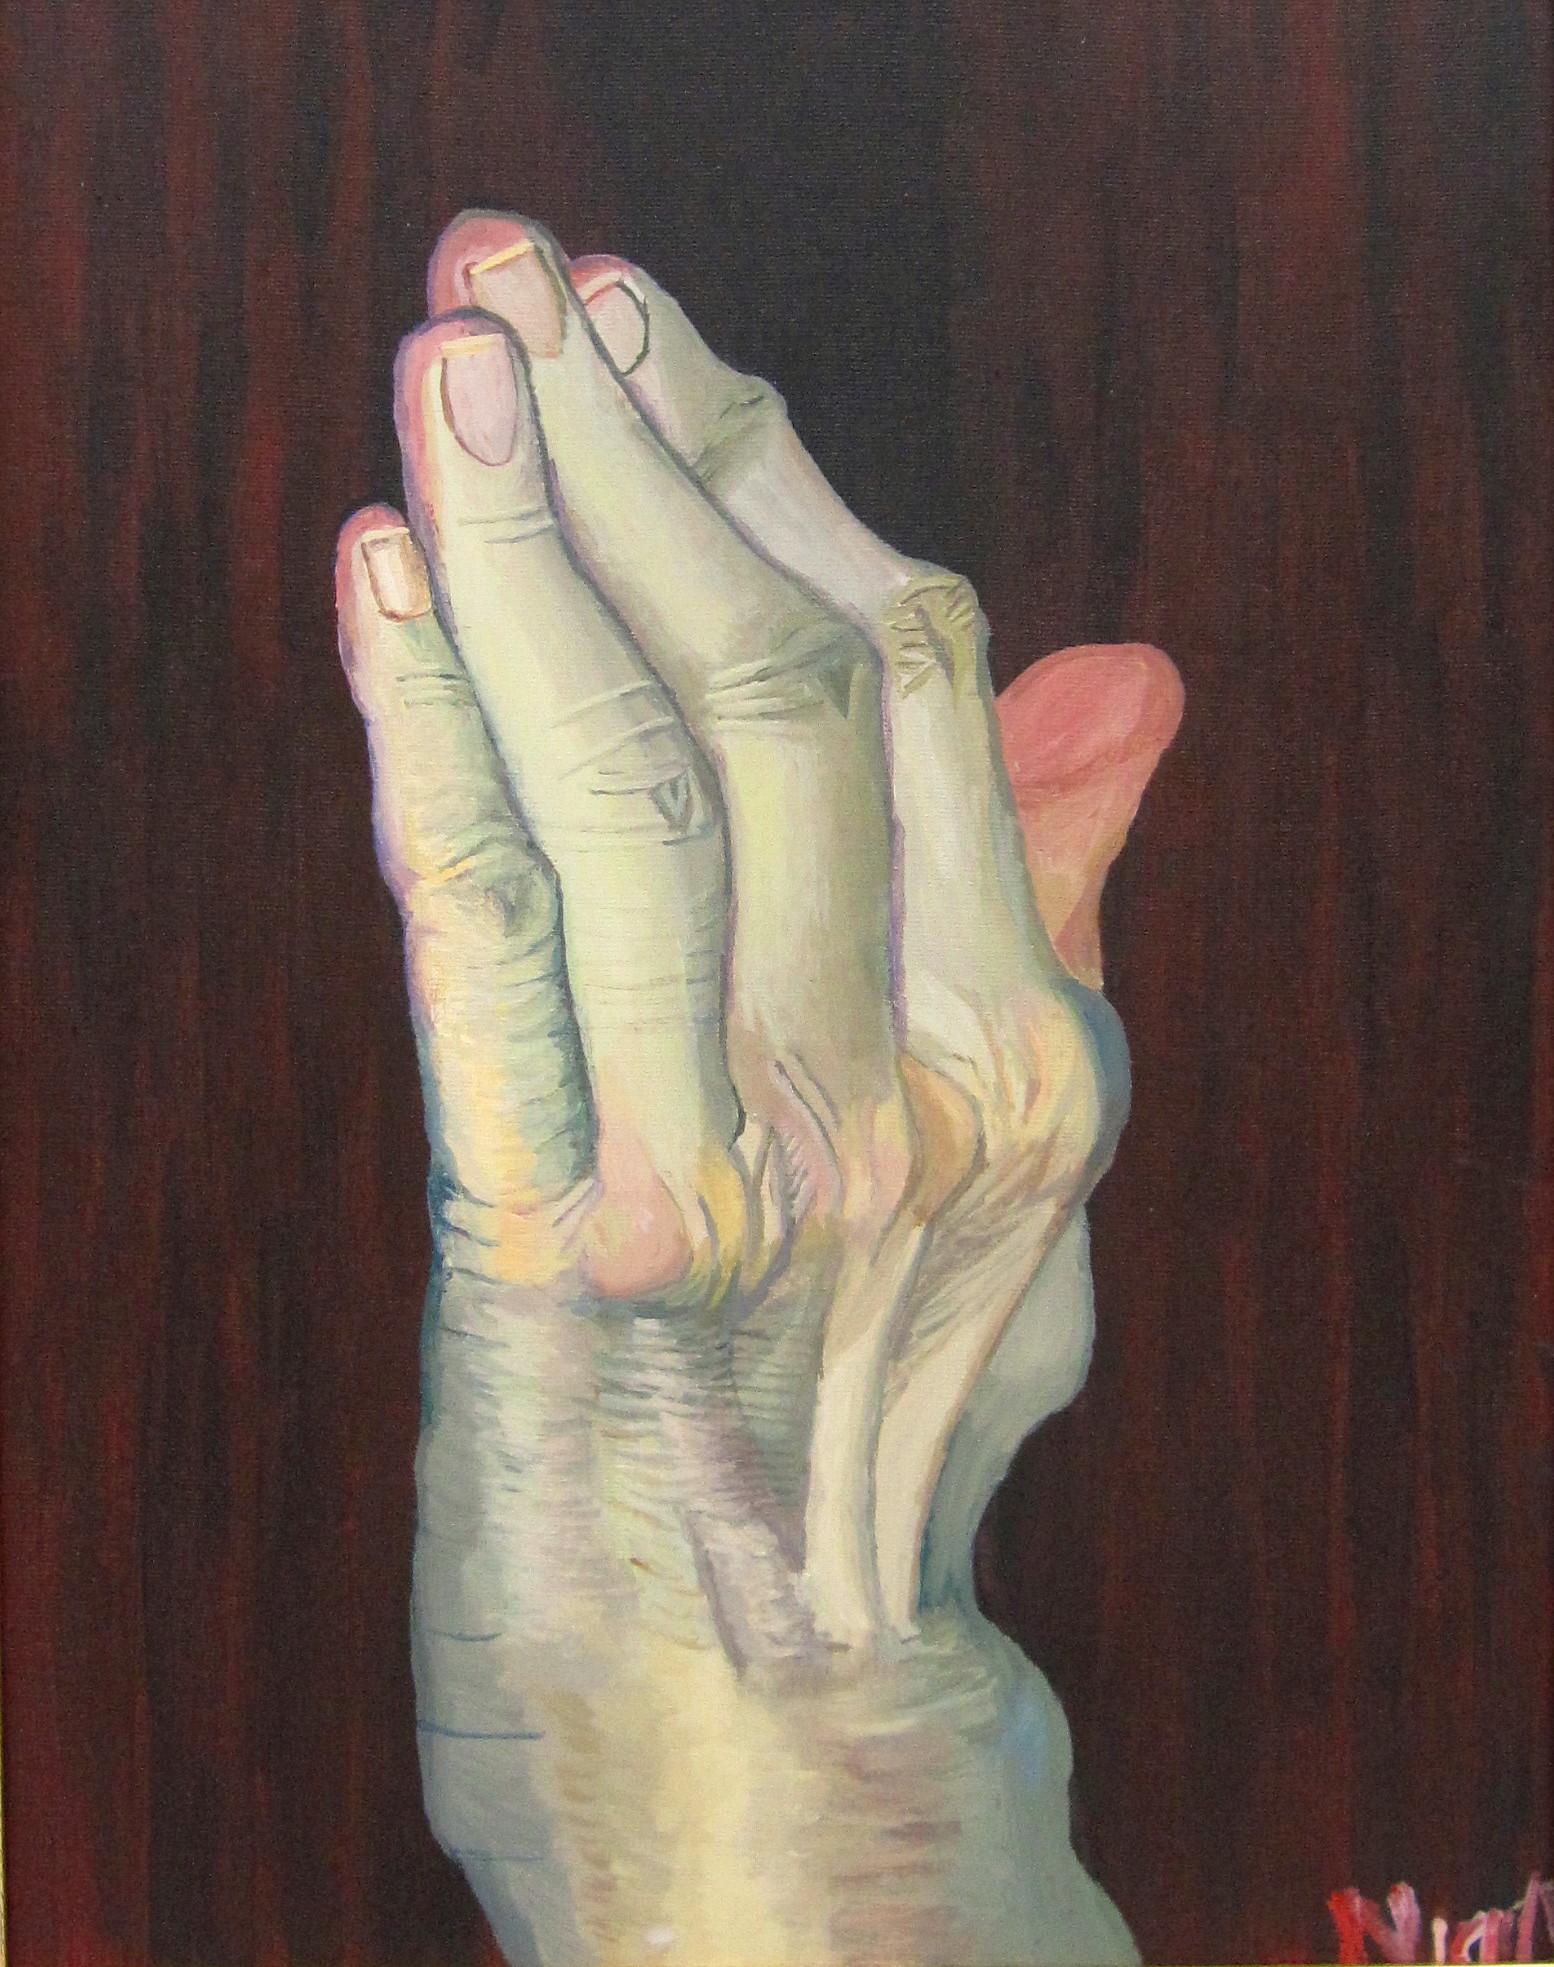 Mam's Arthritic Left Hand